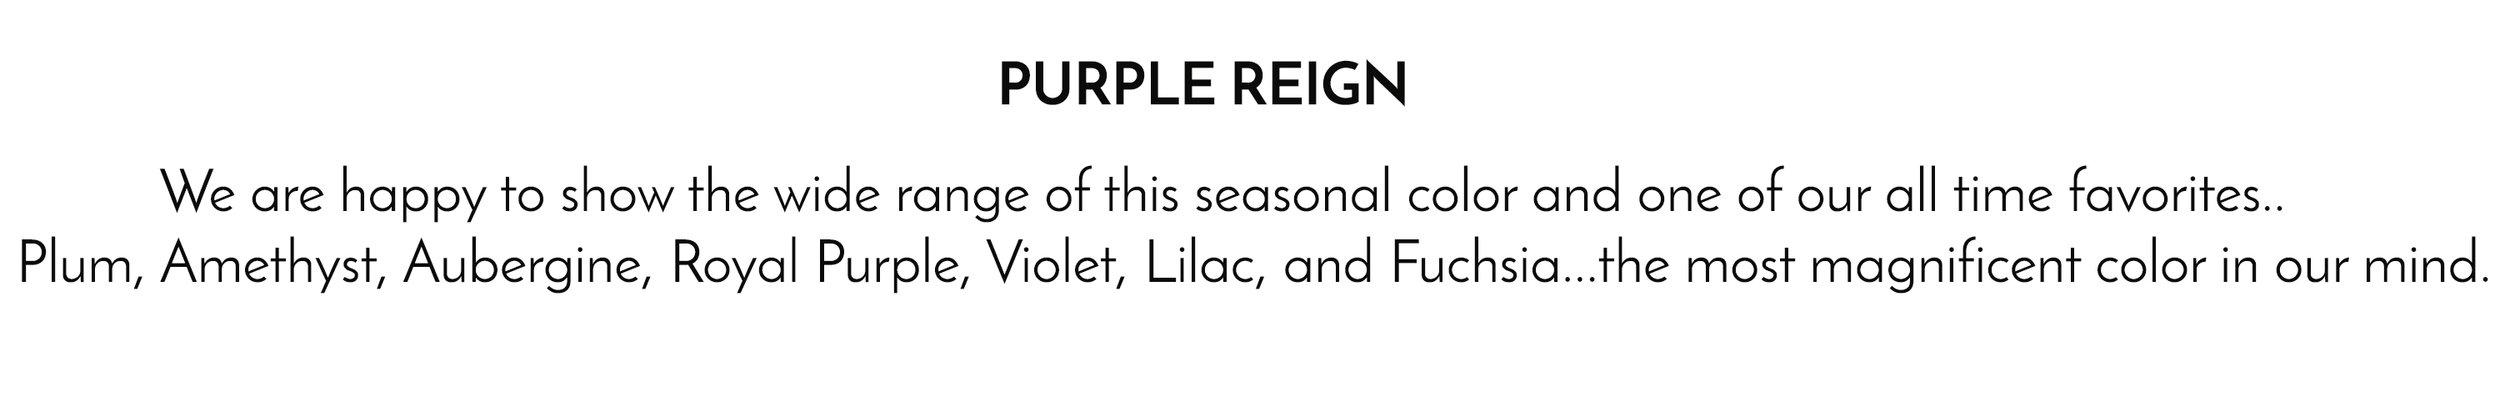 purplereign copy.jpg